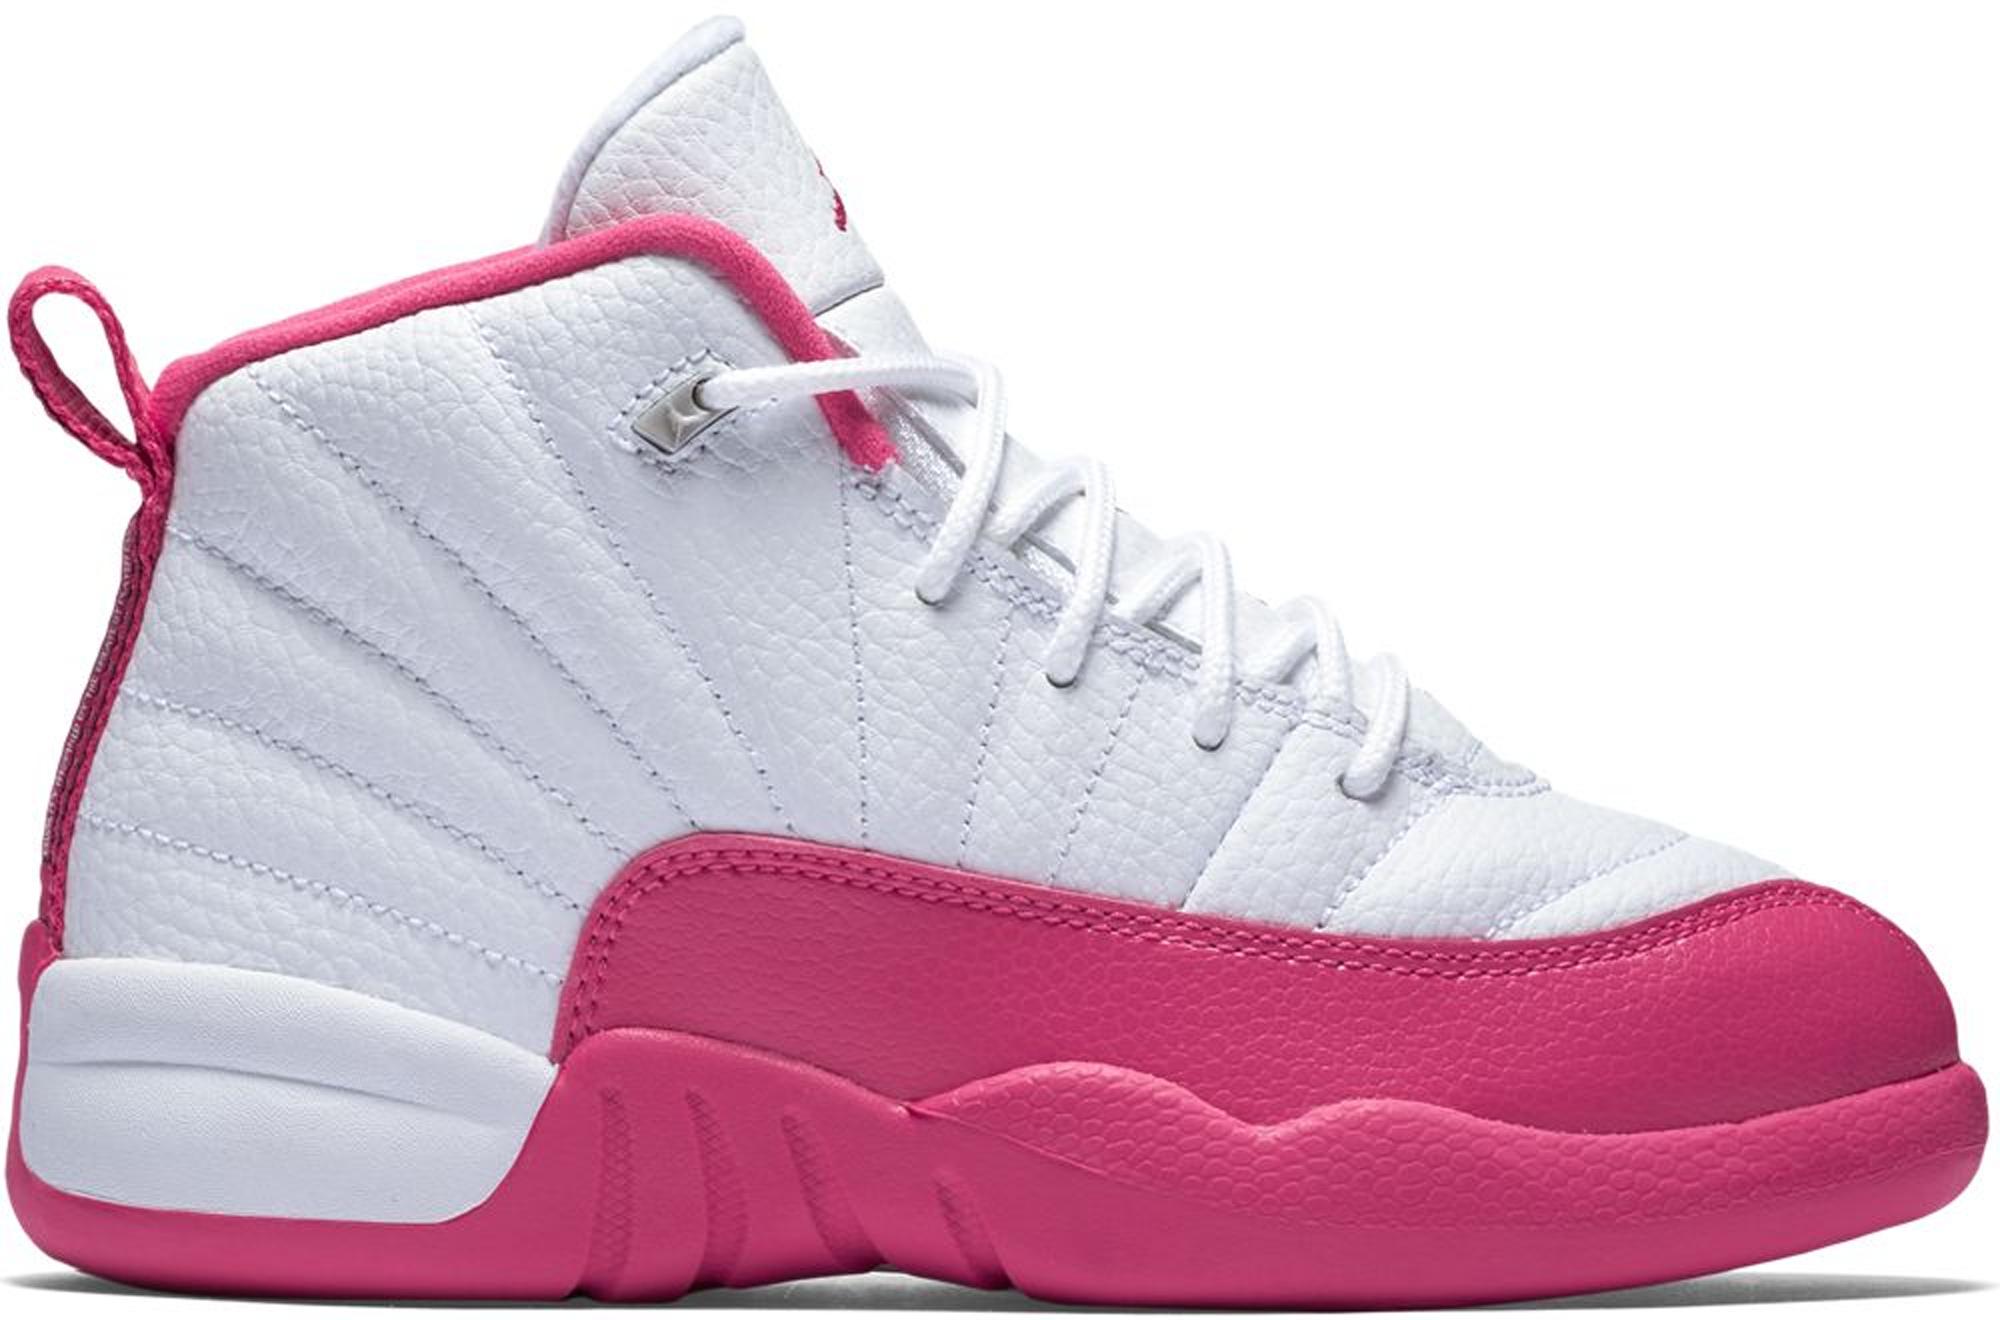 Jordan 12 Retro Dynamic Pink (PS